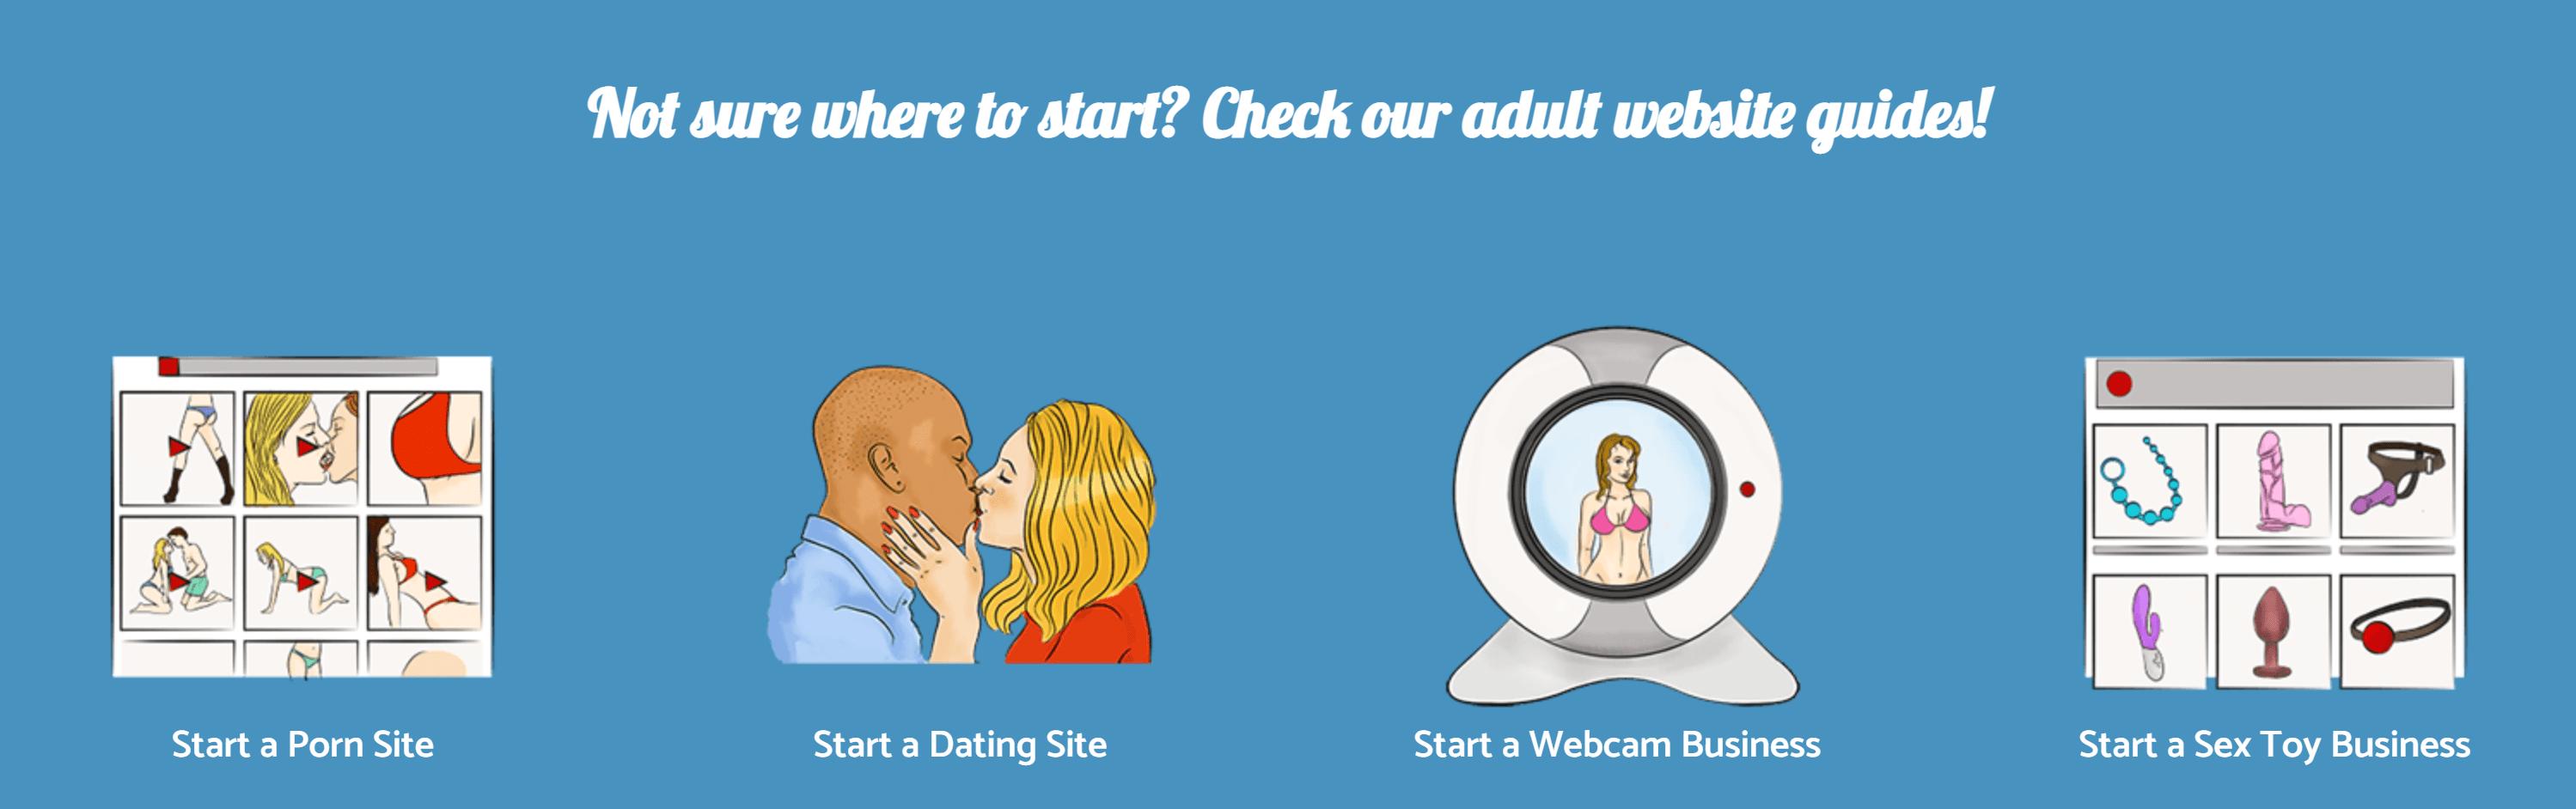 Vicetemple adult hosting platform review